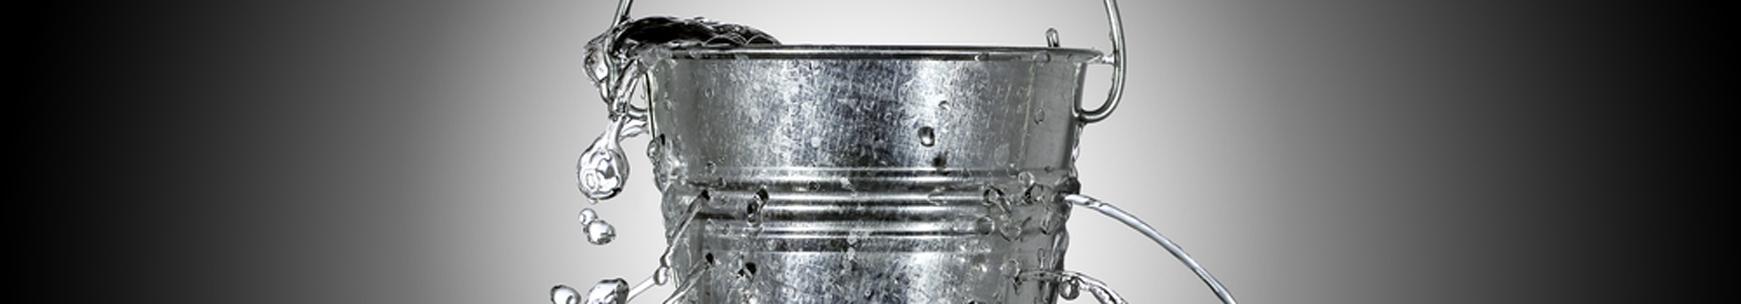 leakey bucket